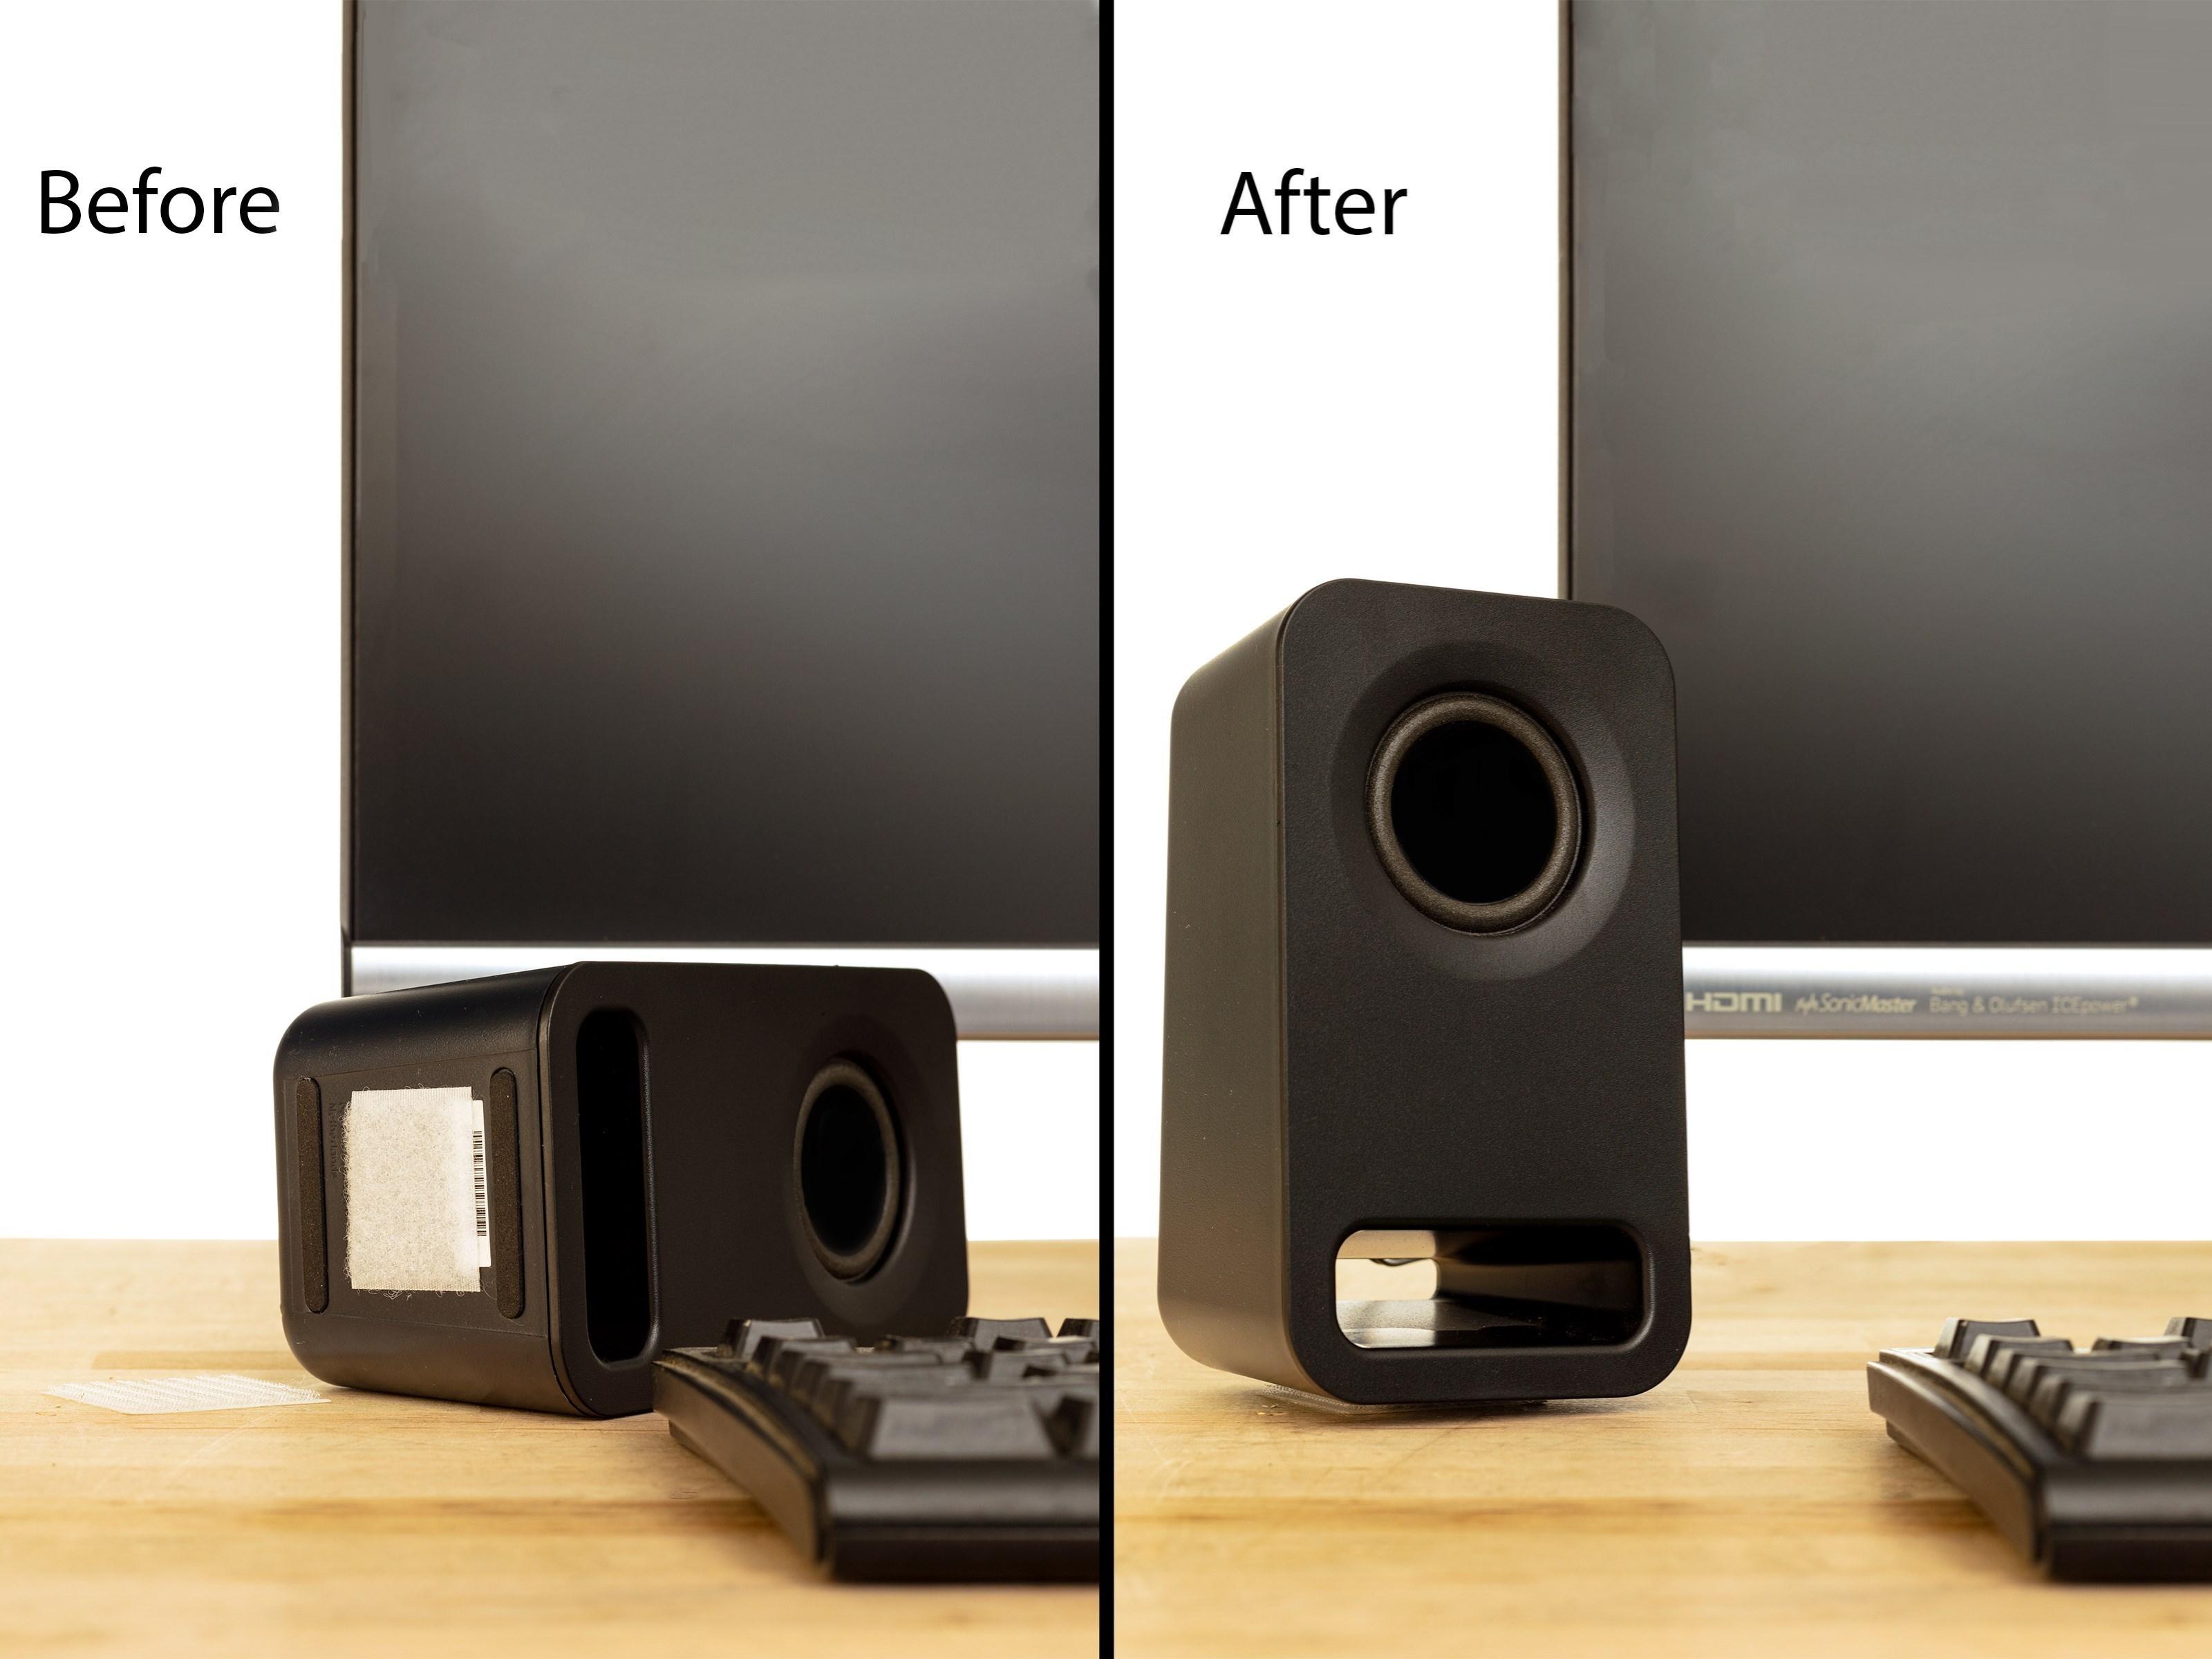 5 Yards 1 Inch White Self-Adhesive Hook and Loop Tape